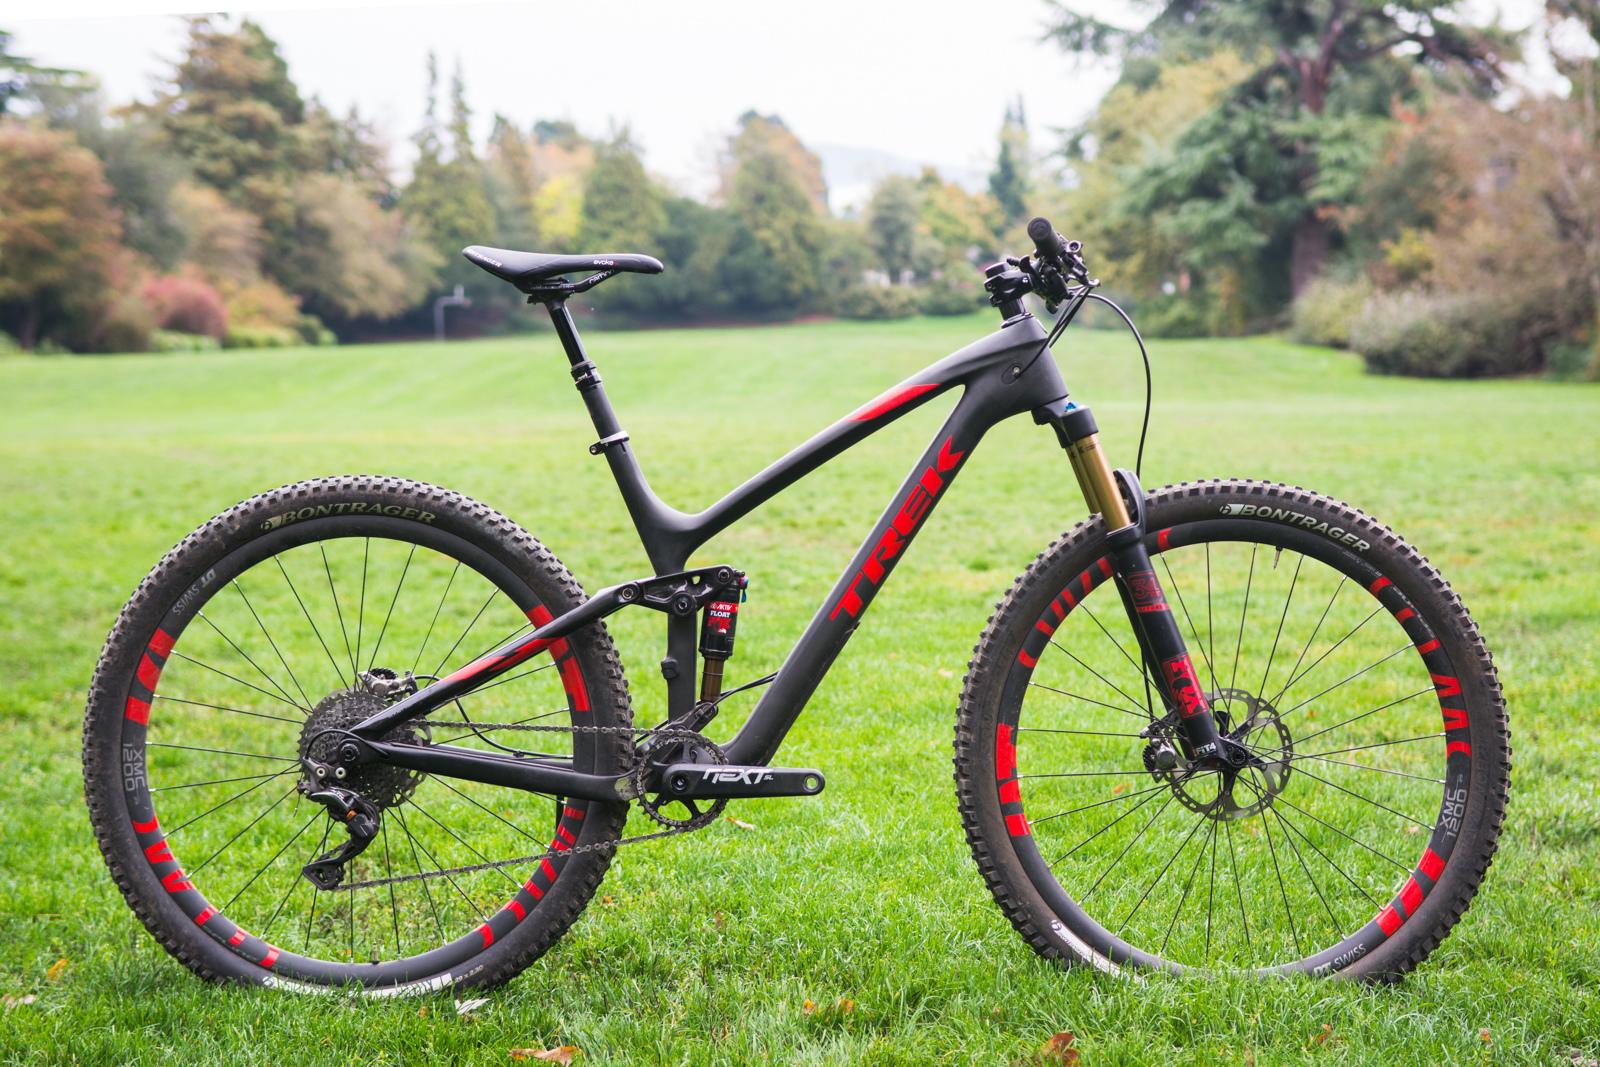 2d9134e3b25 Review: Trek Fuel EX 9.9 29 - Pinkbike